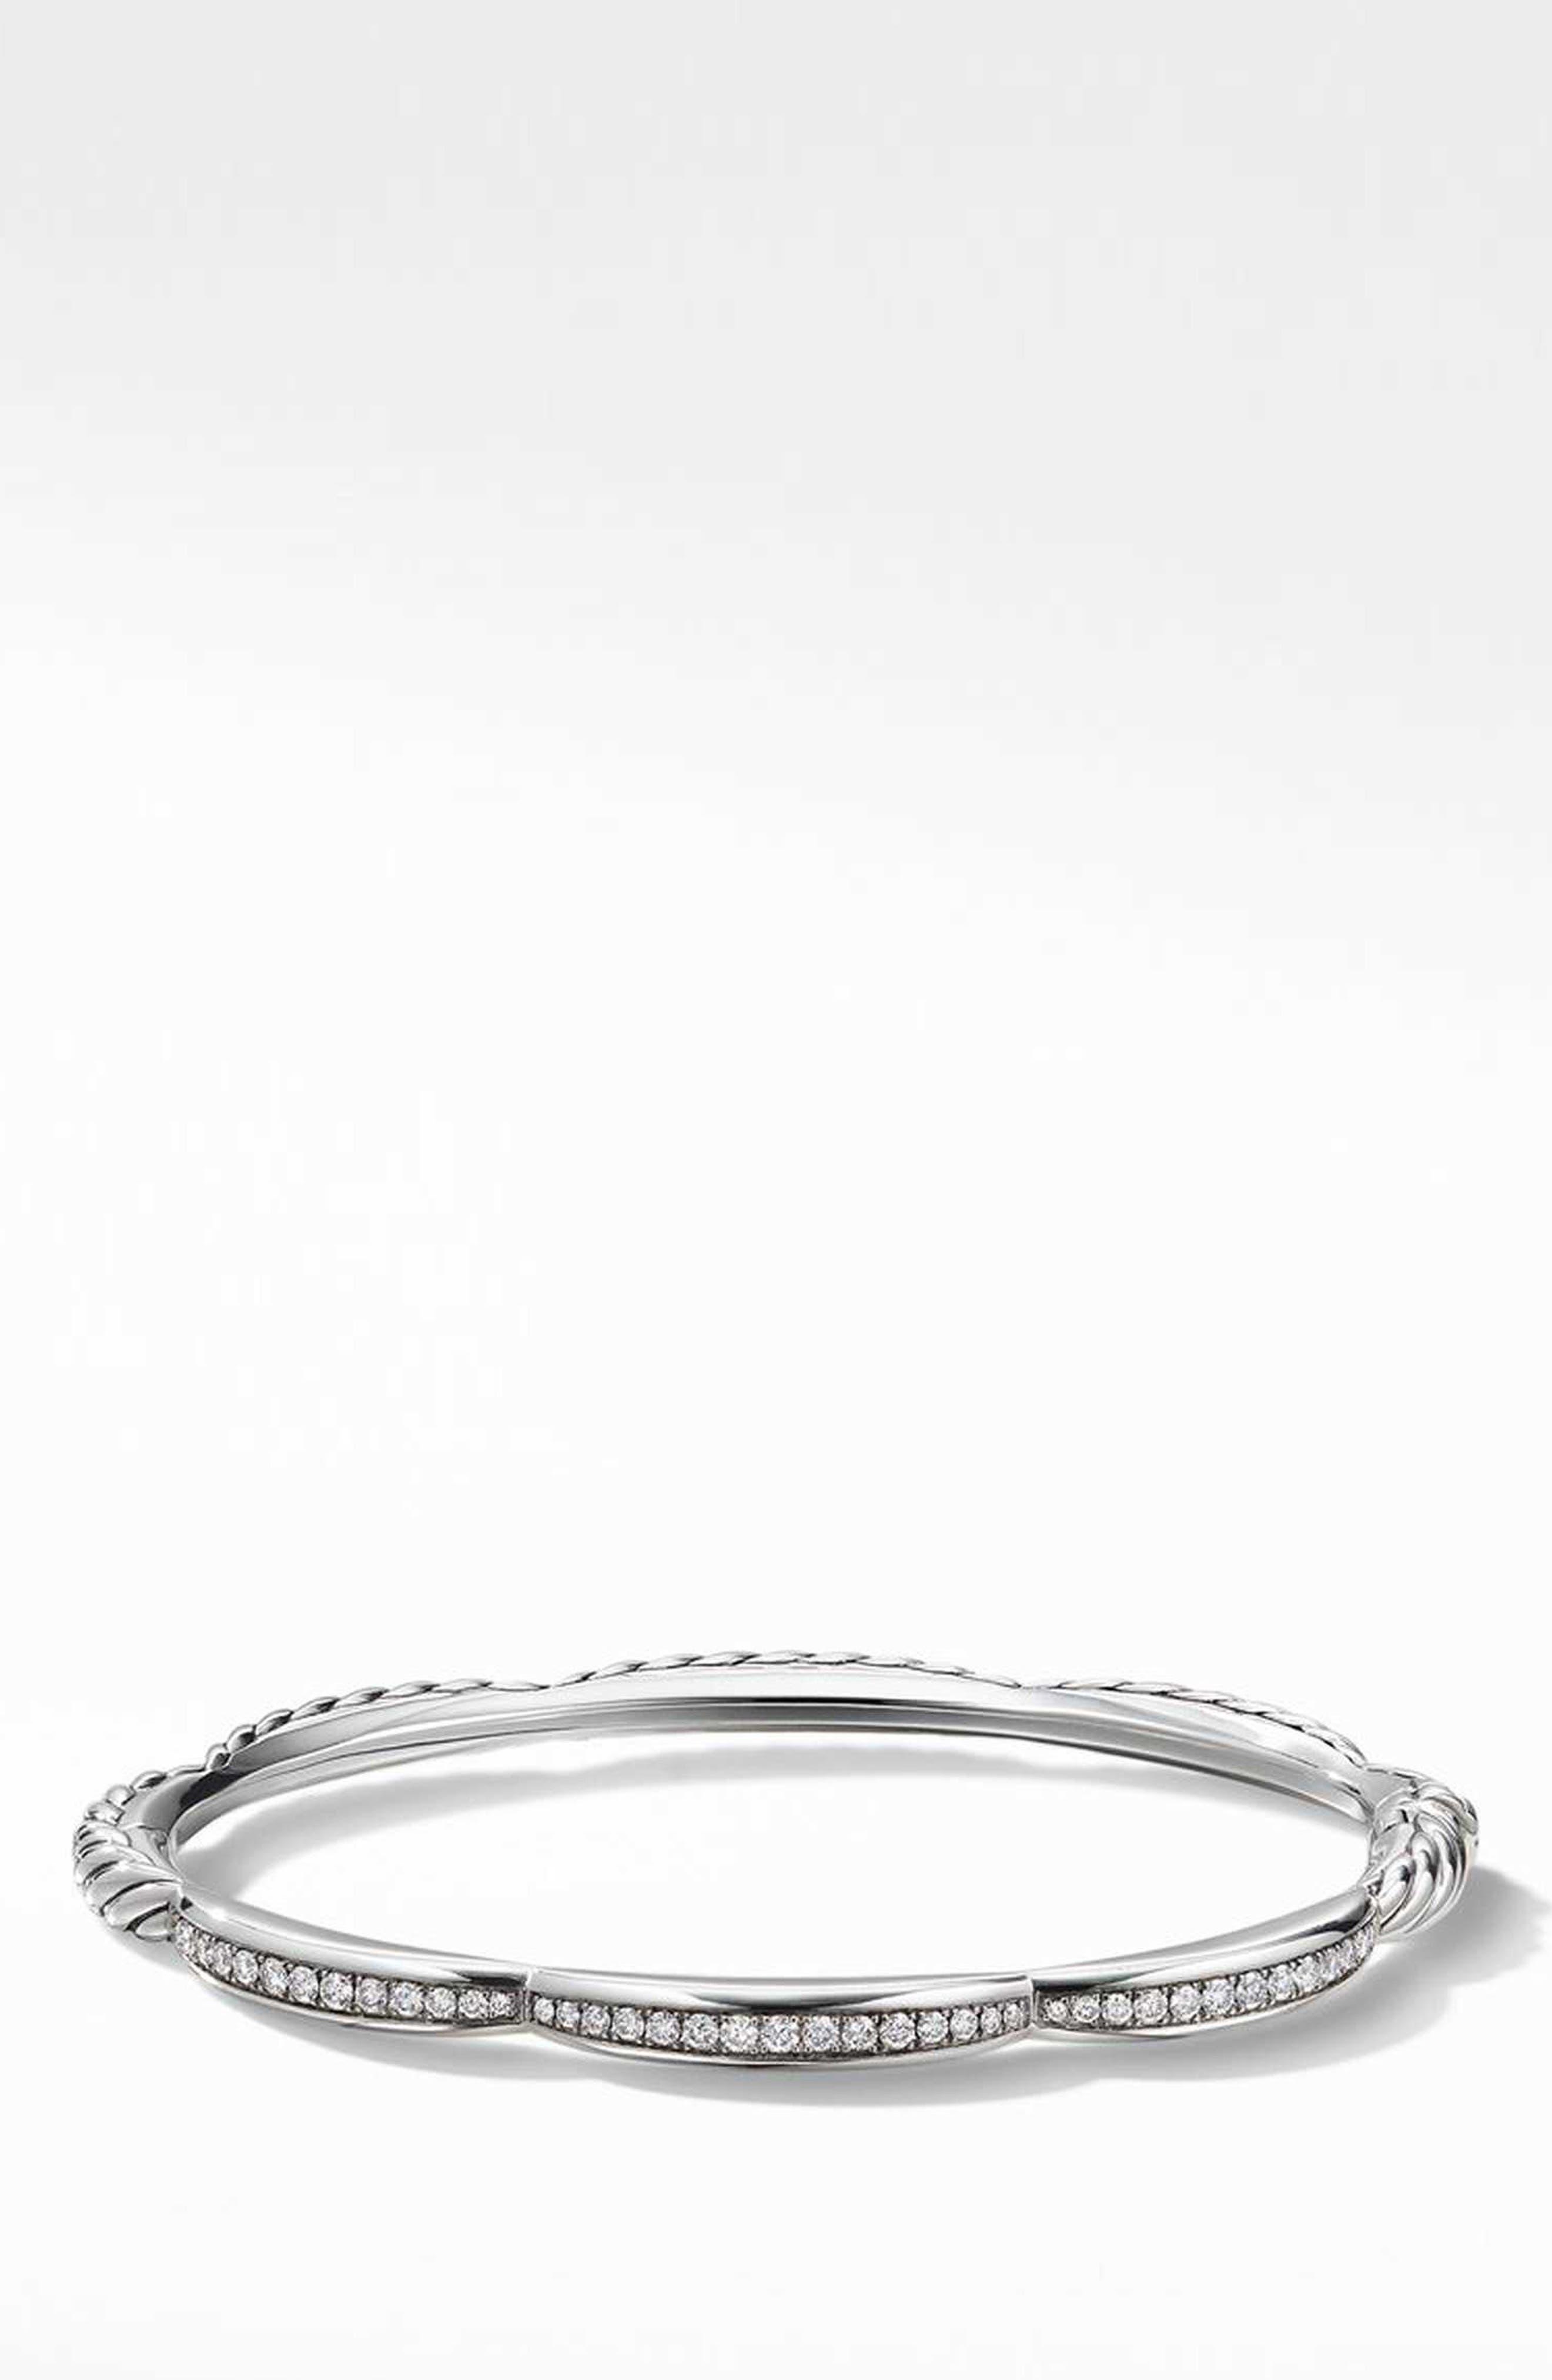 Tides 3-Station Bracelet with Diamonds,                             Main thumbnail 1, color,                             STERLING SILVER/ DIAMOND